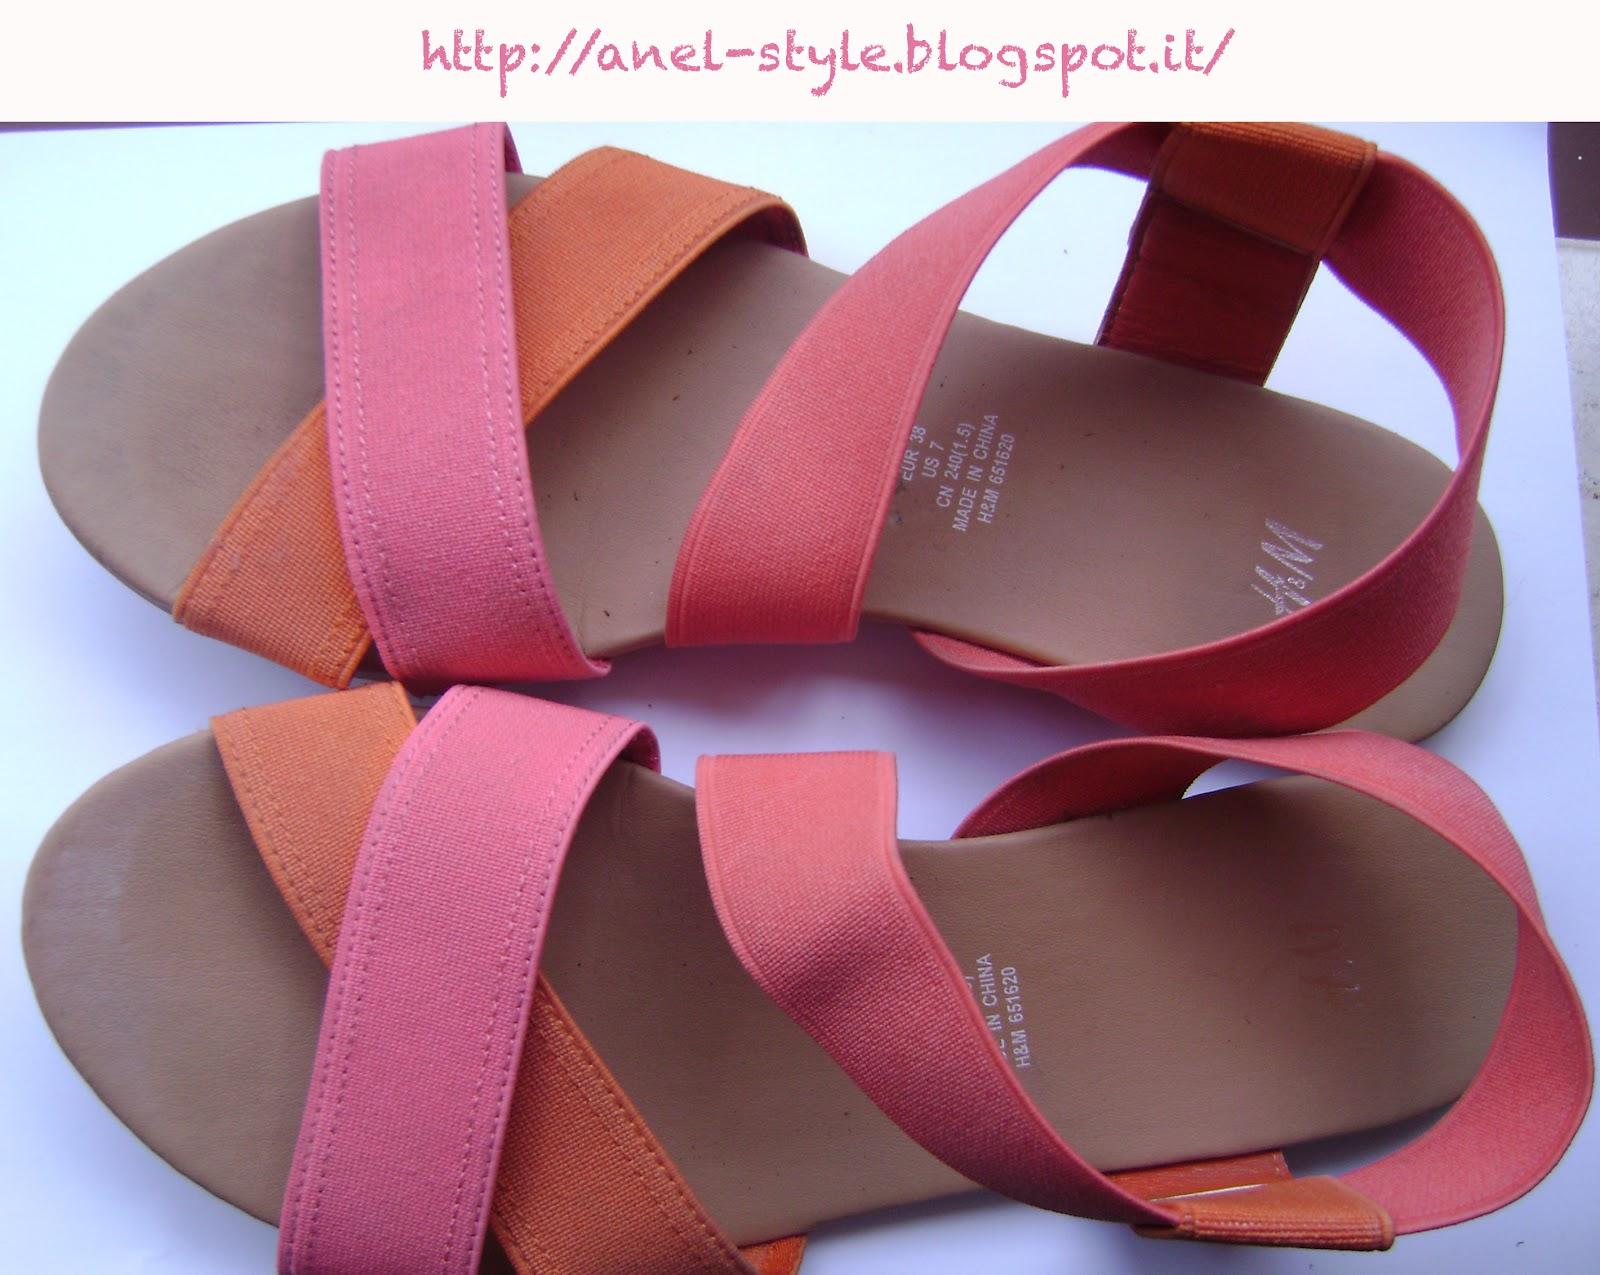 finest selection b98ec 5c112 Anel-Style: Sandali H&M